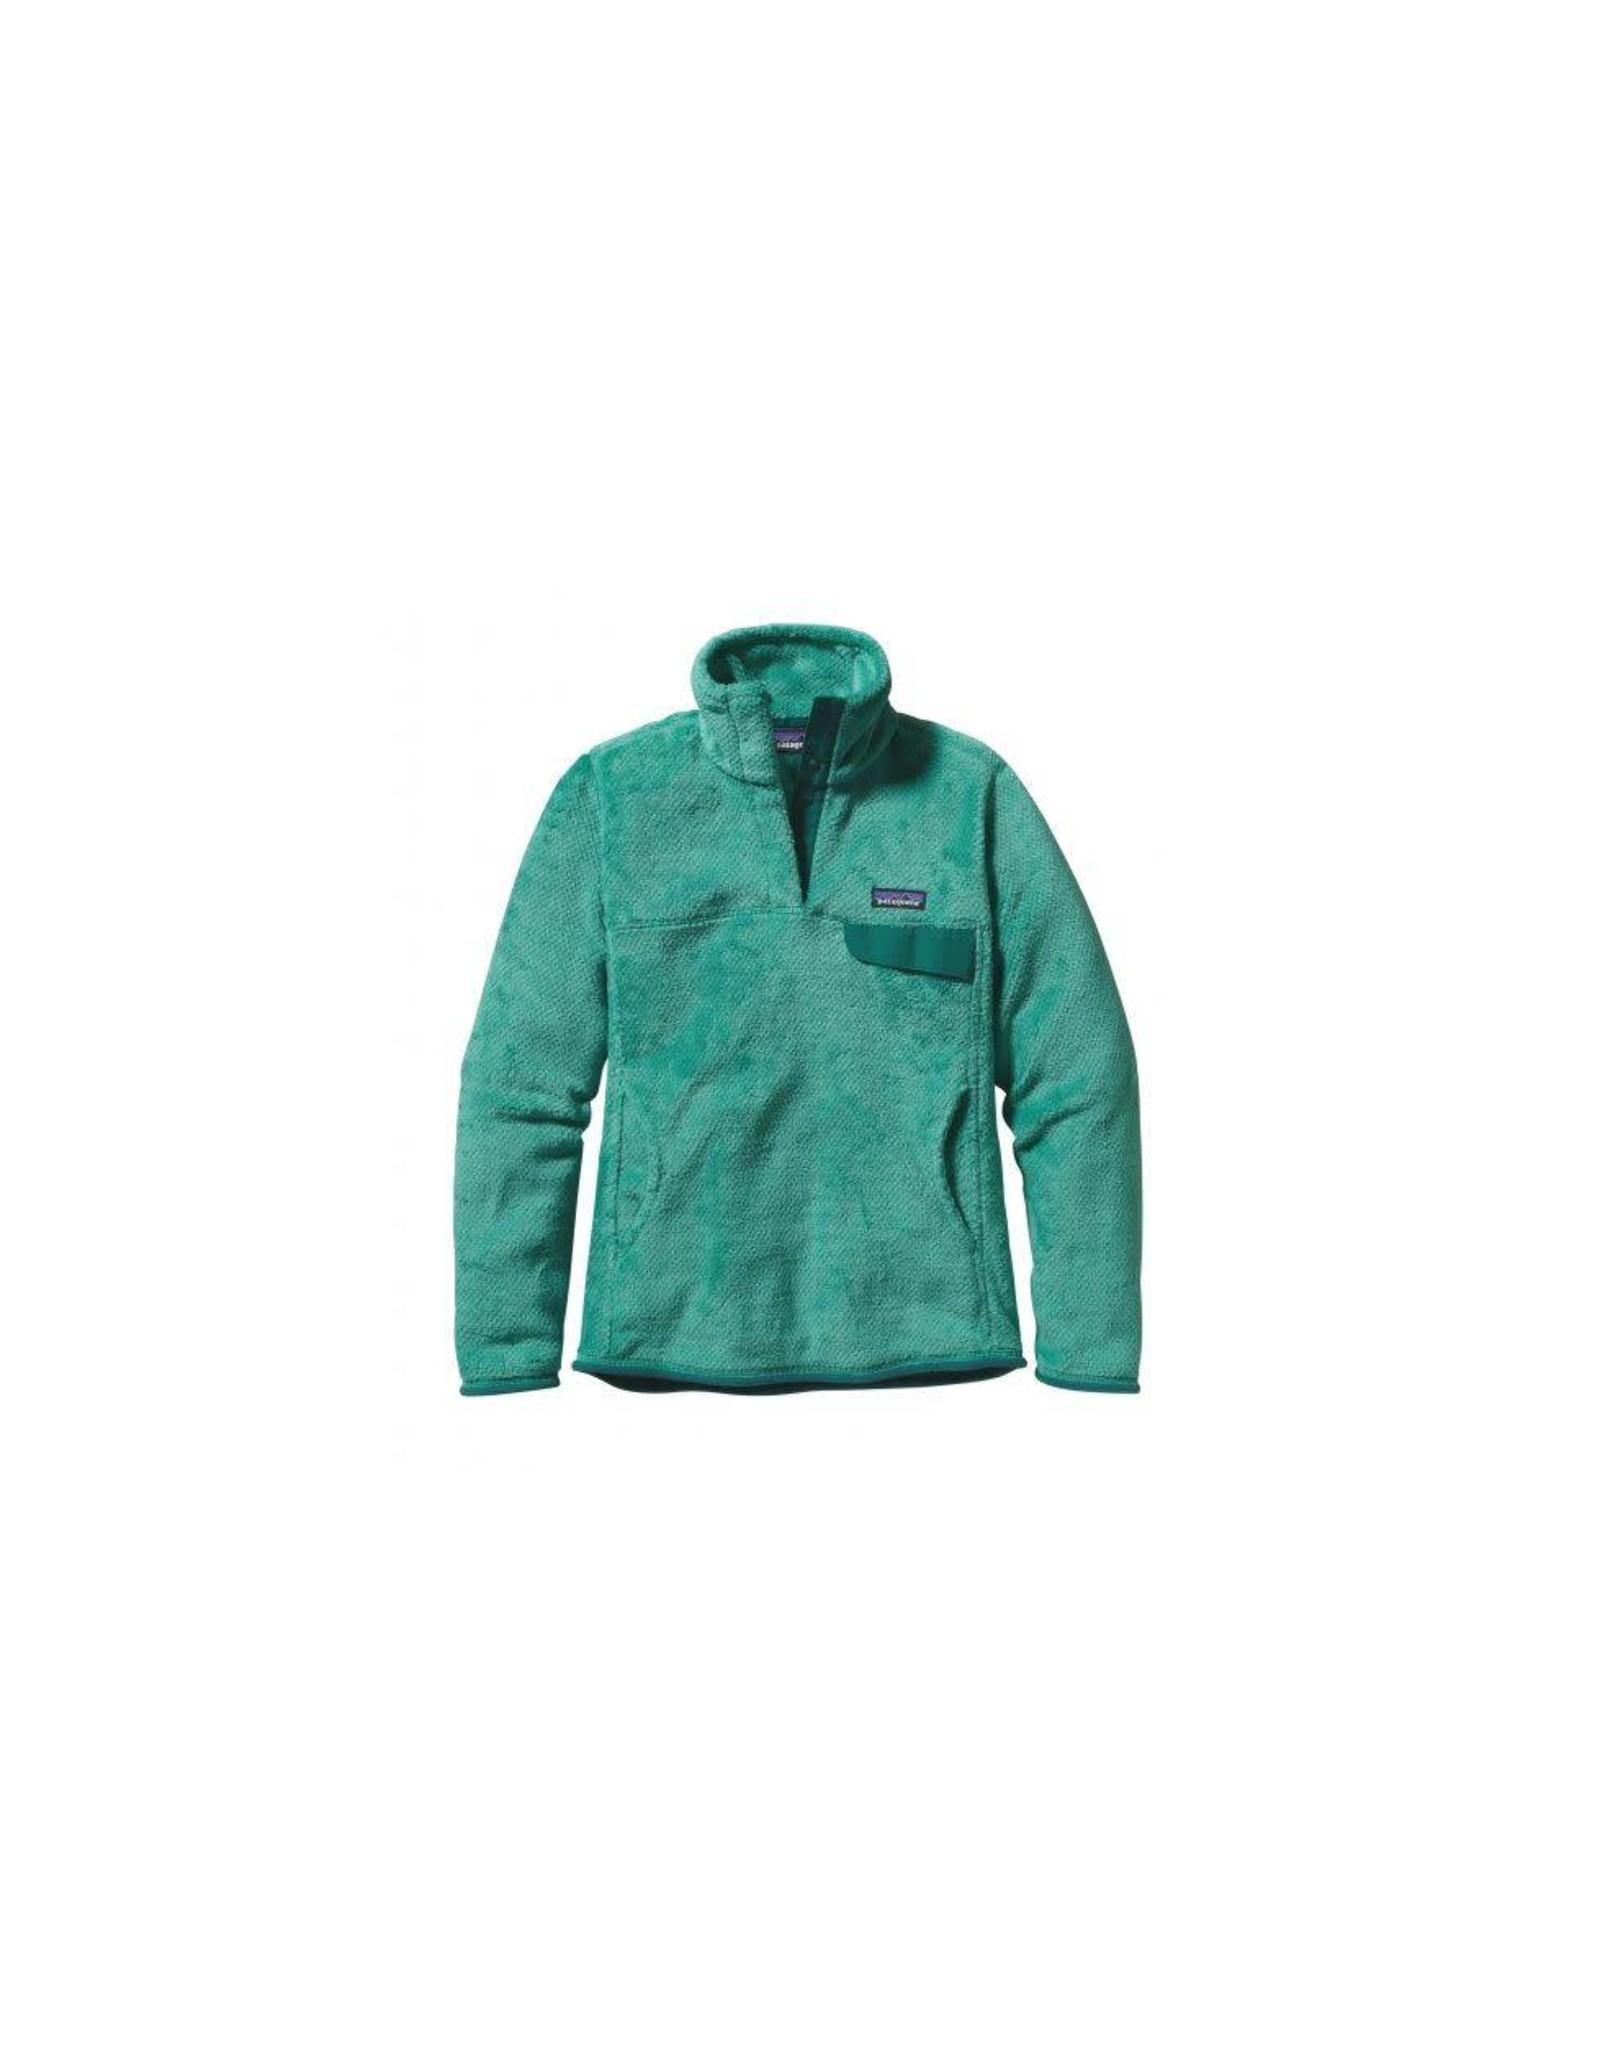 Patagonia Patagonia Women's Re-Tool Snap Fleece Pullover